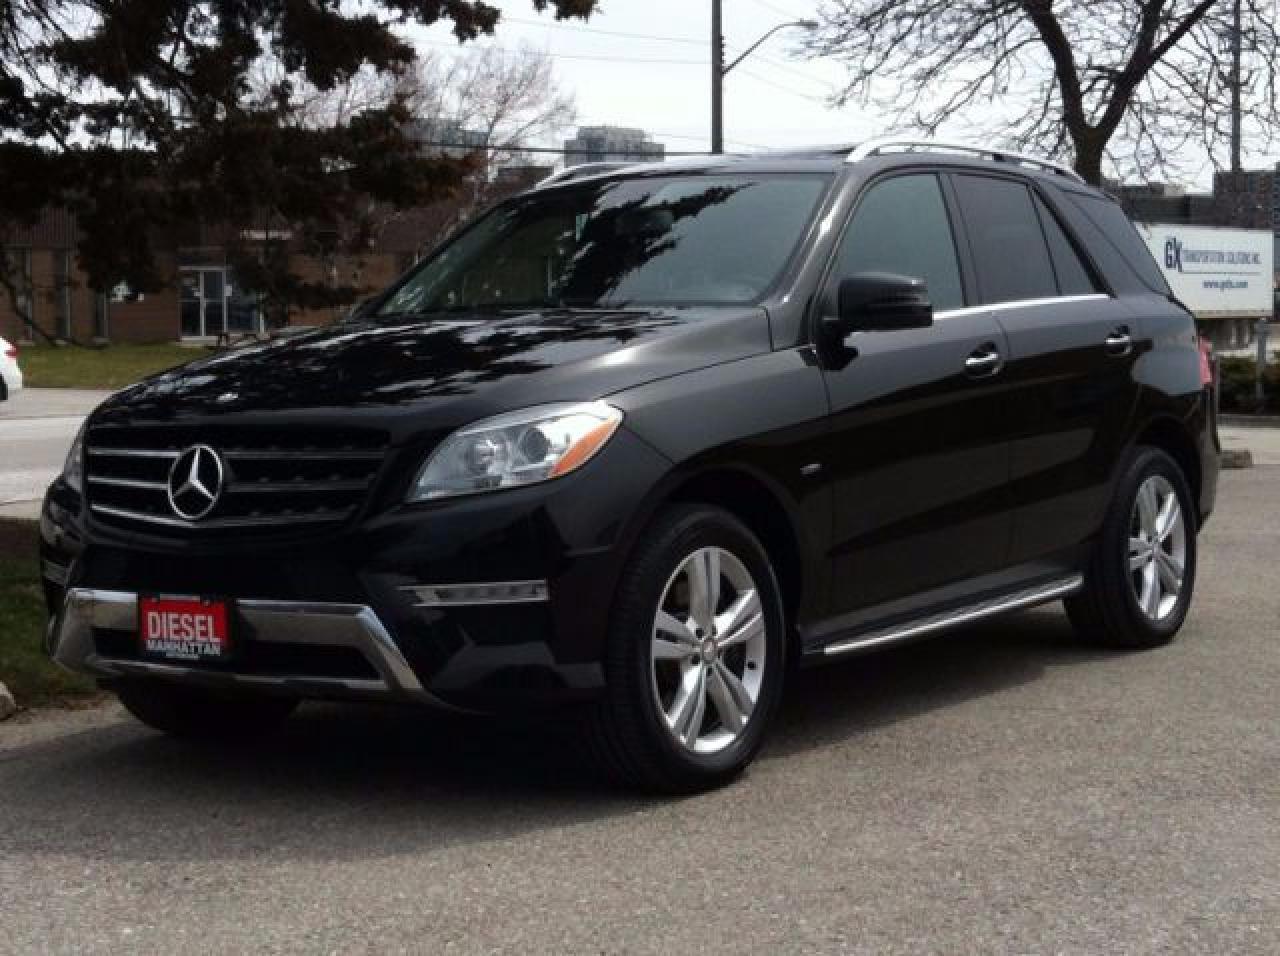 Photo of Black 2012 Mercedes-Benz ML 350